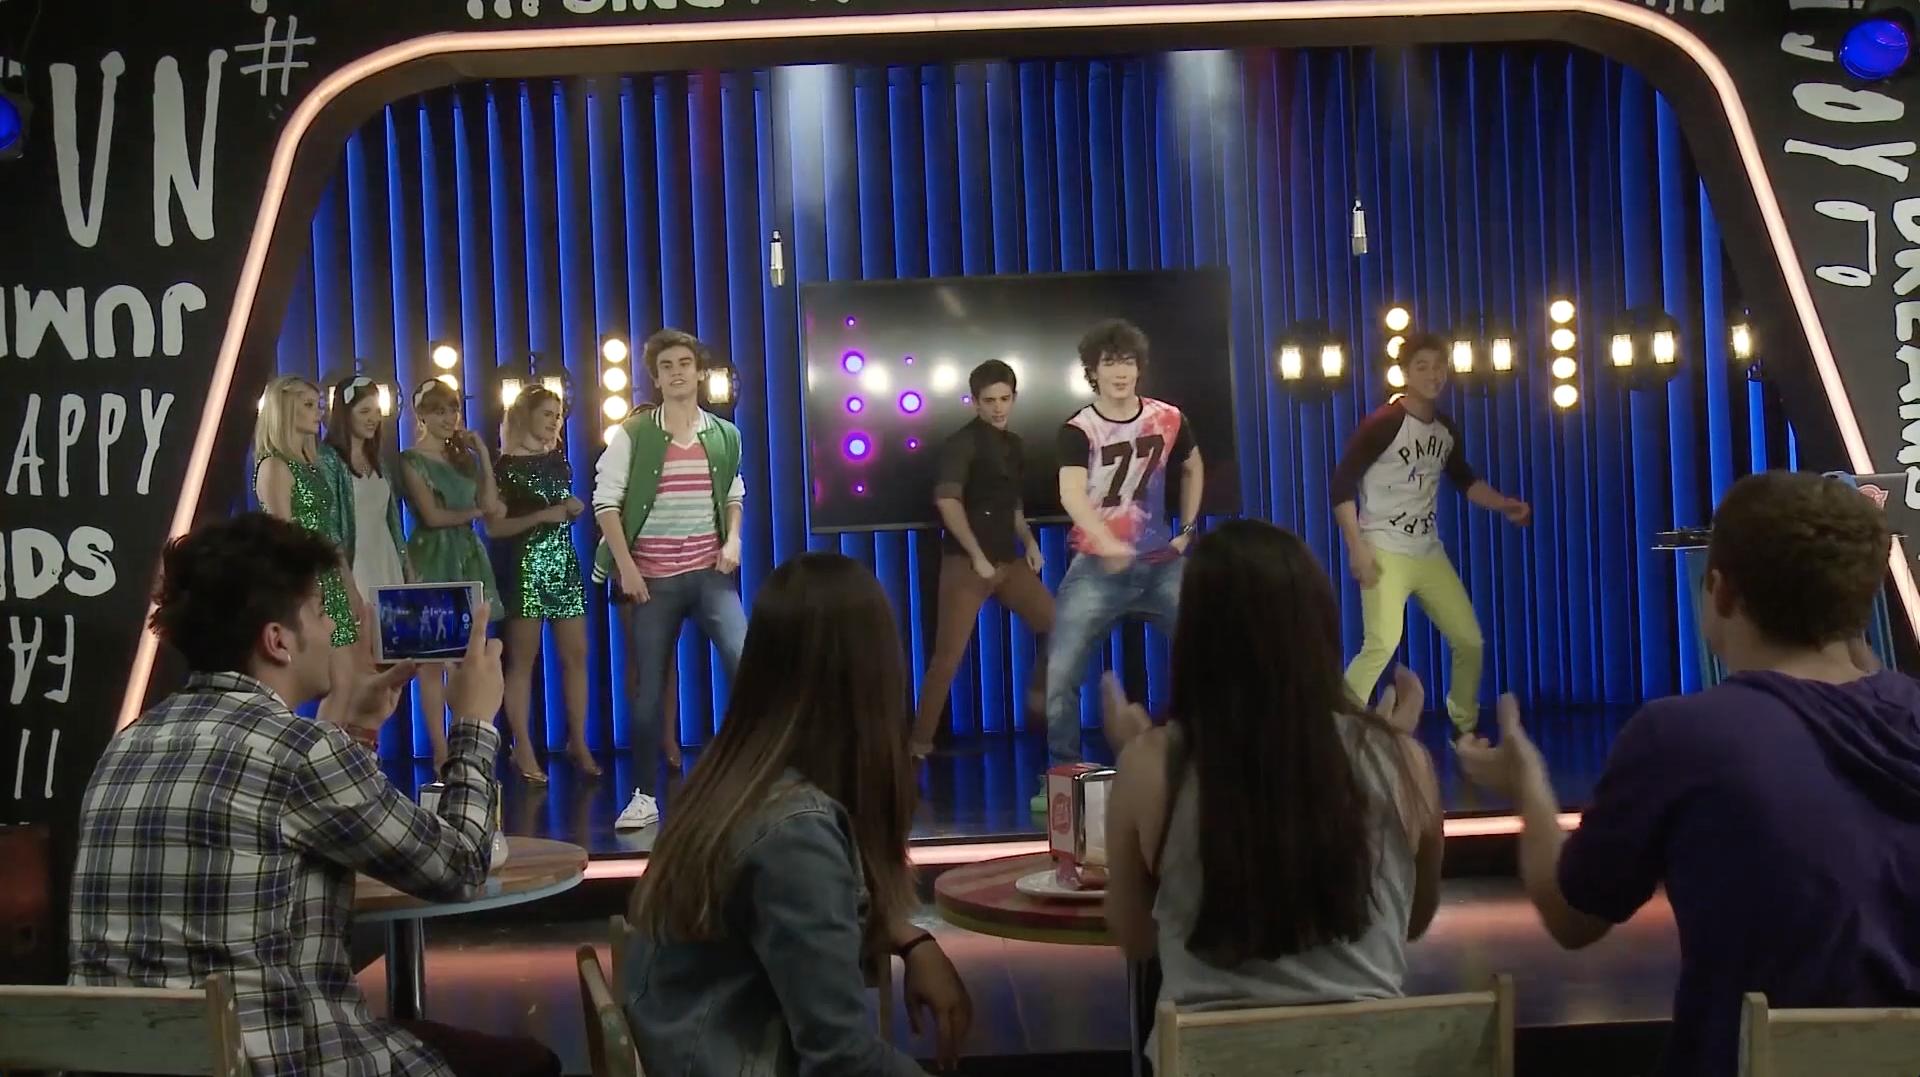 Open Music #3: Cuando bailo - Momento Musical - Soy Luna